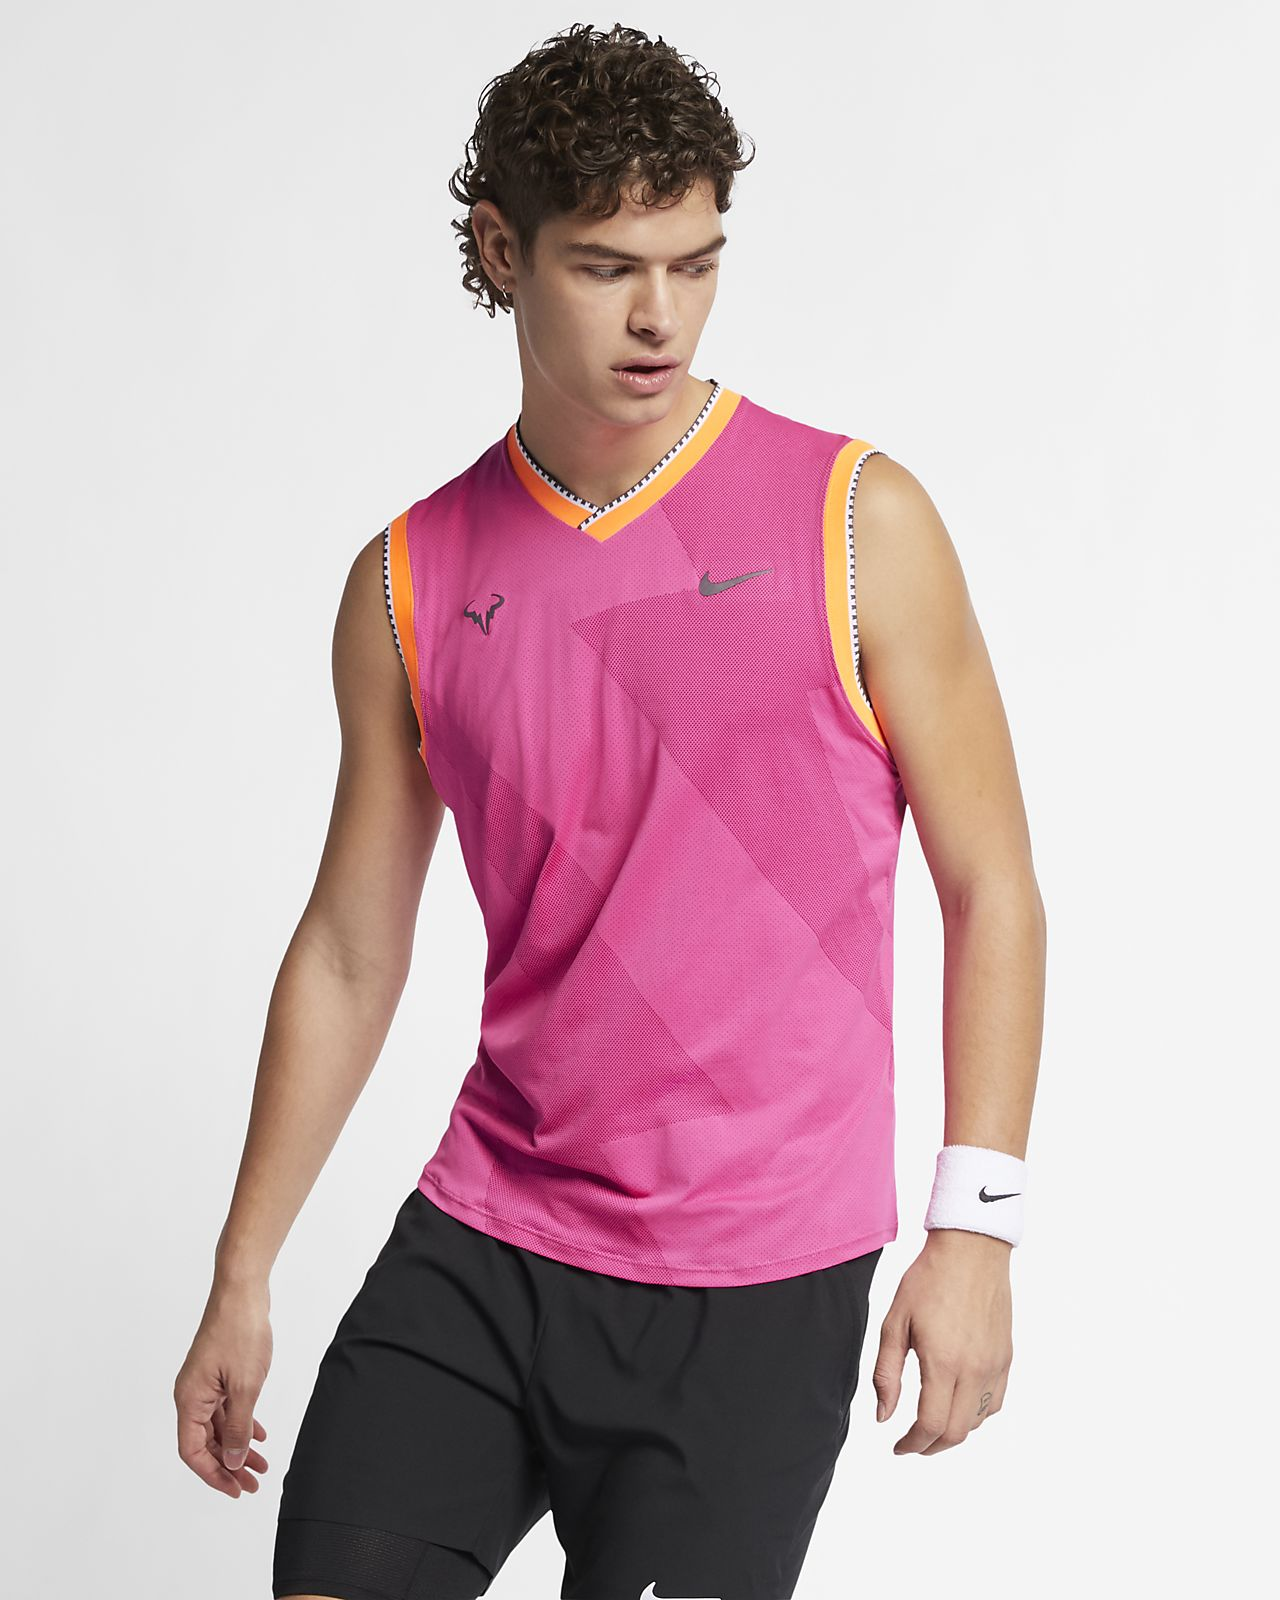 NikeCourt AeroReact Rafa ärmelloses Tennisoberteil für Herren